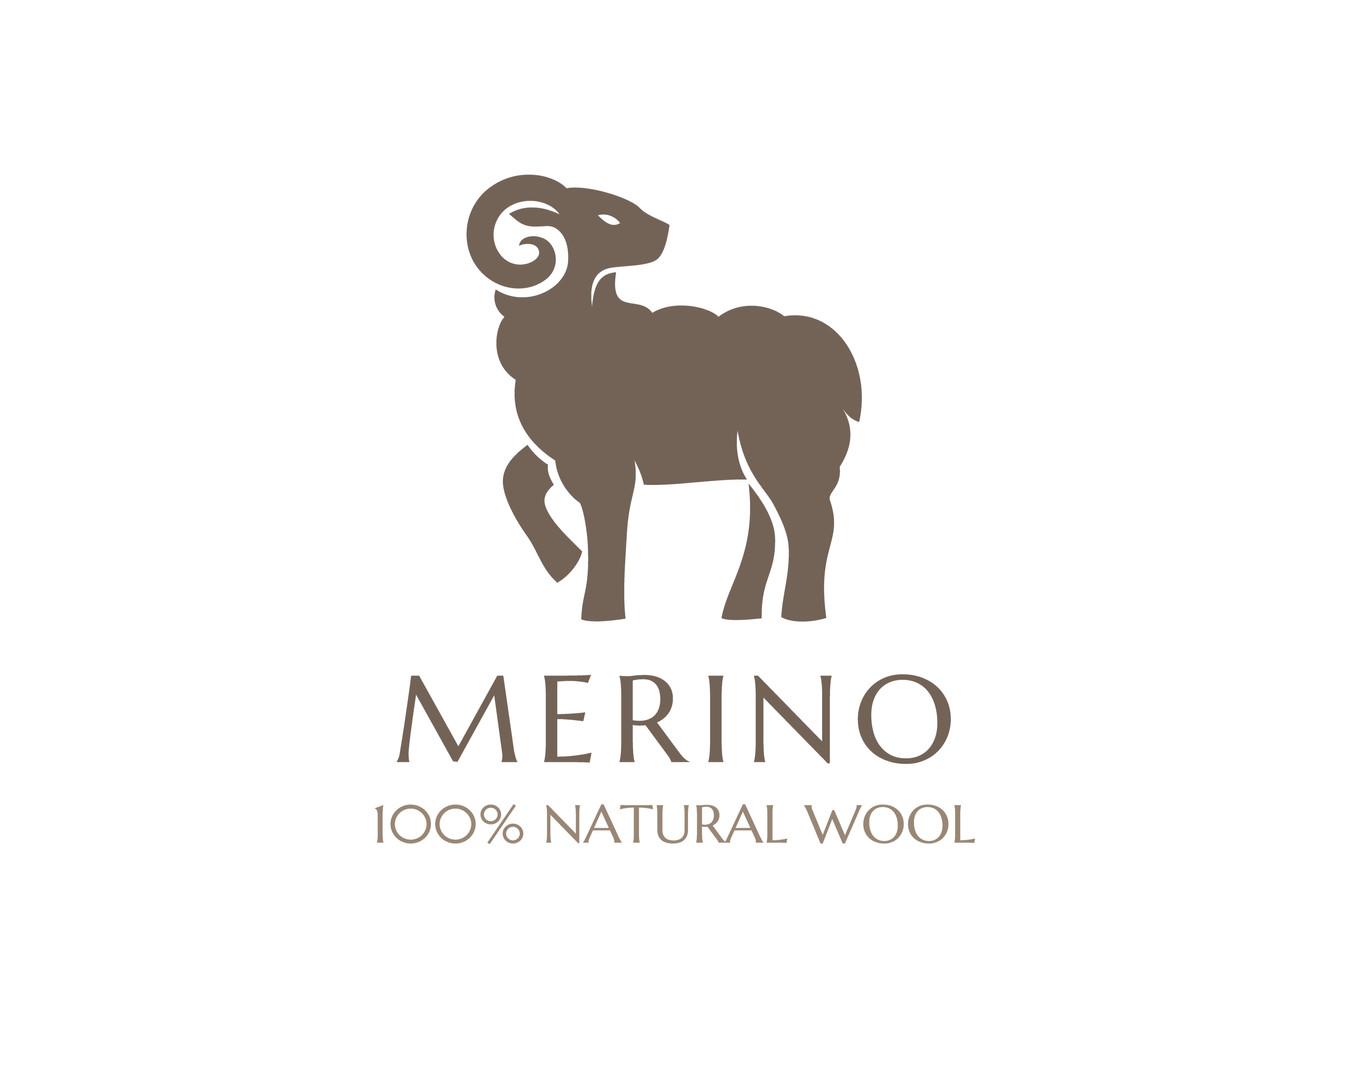 100%_Merino_Wool_Logo.jpg